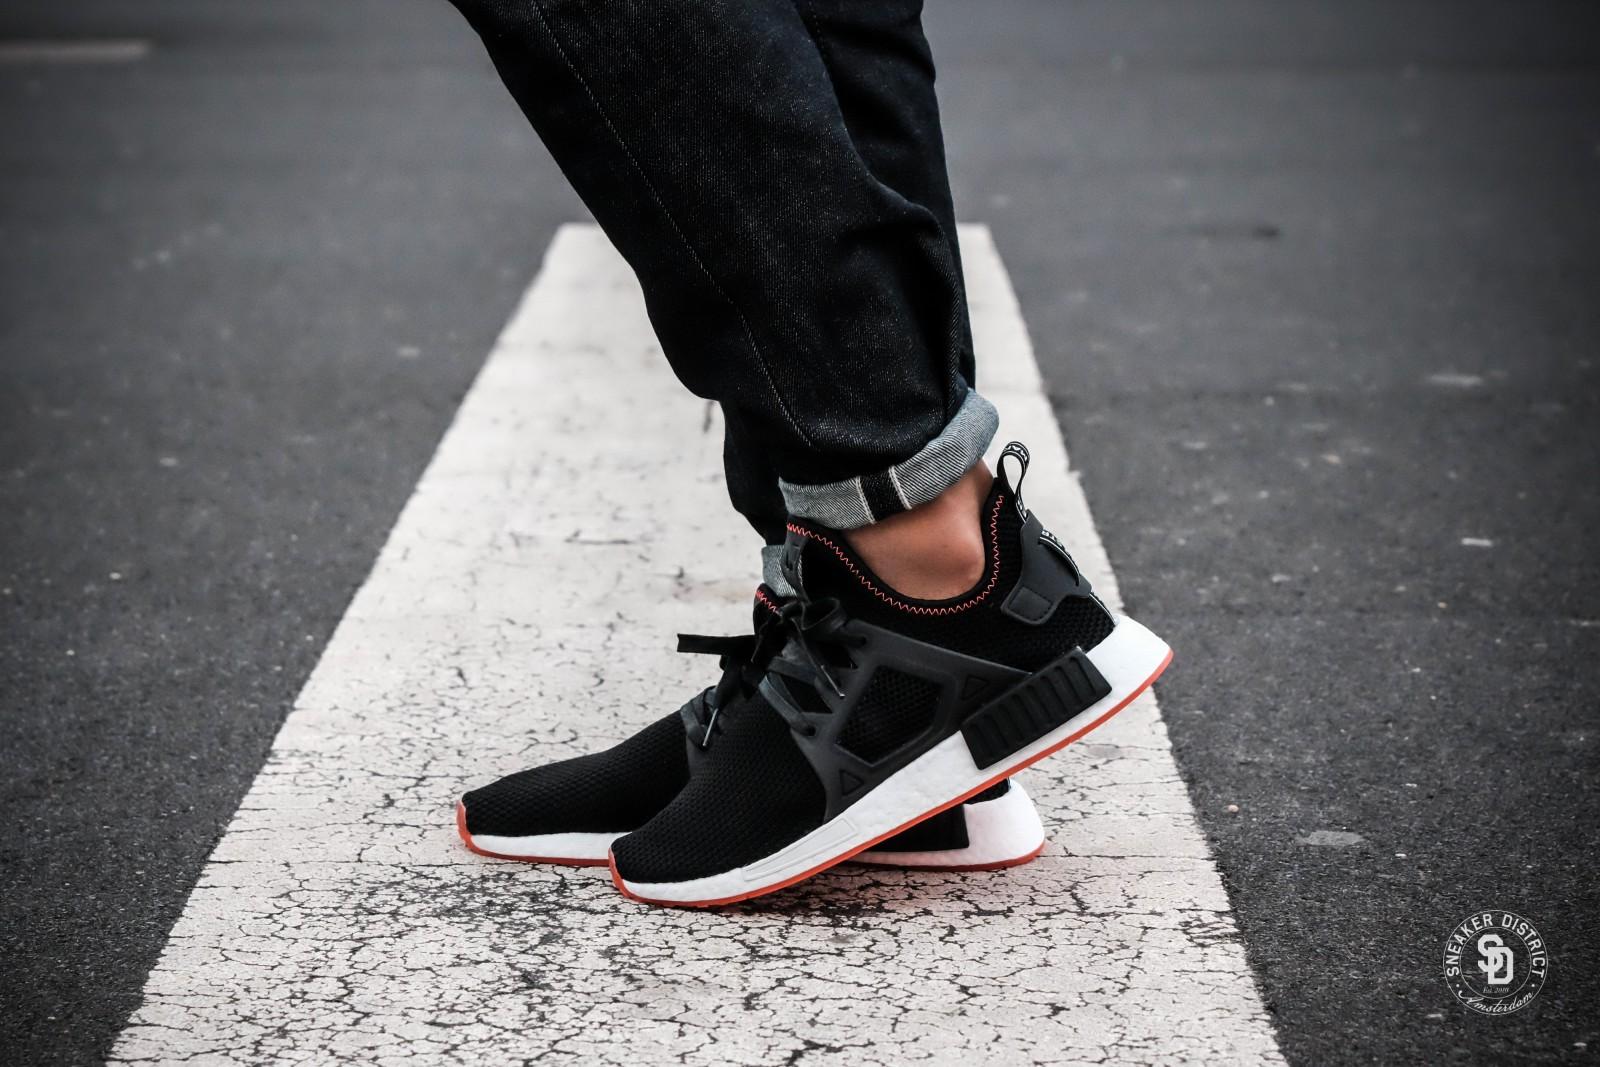 Adidas NMD XR1 Core BlackSolar Red BY9924